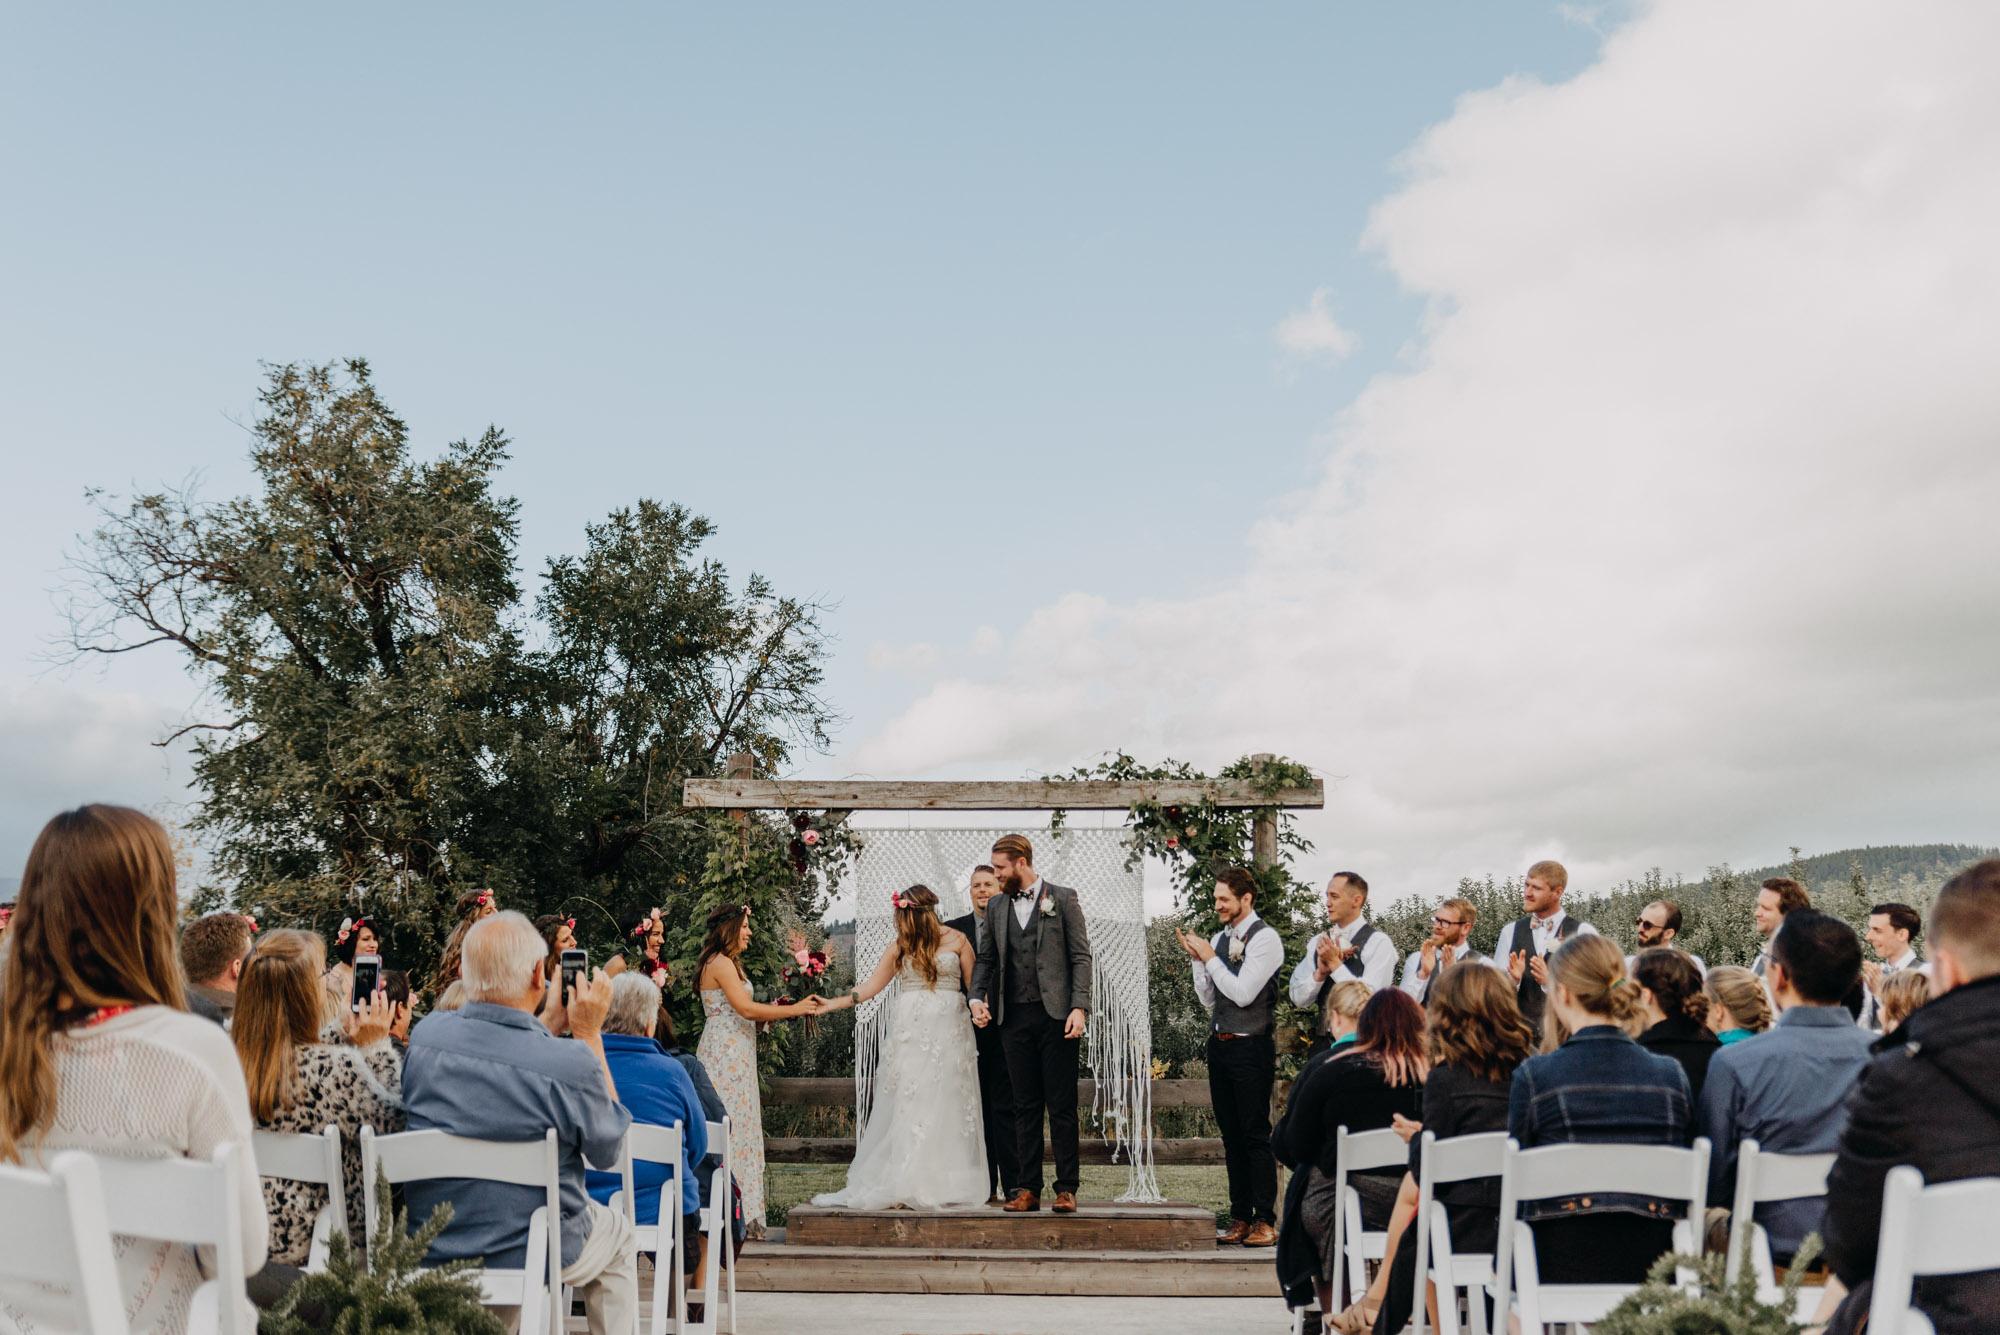 Outdoor-Summer-Ceremony-Washington-Wedding-Rainbow-5432.jpg